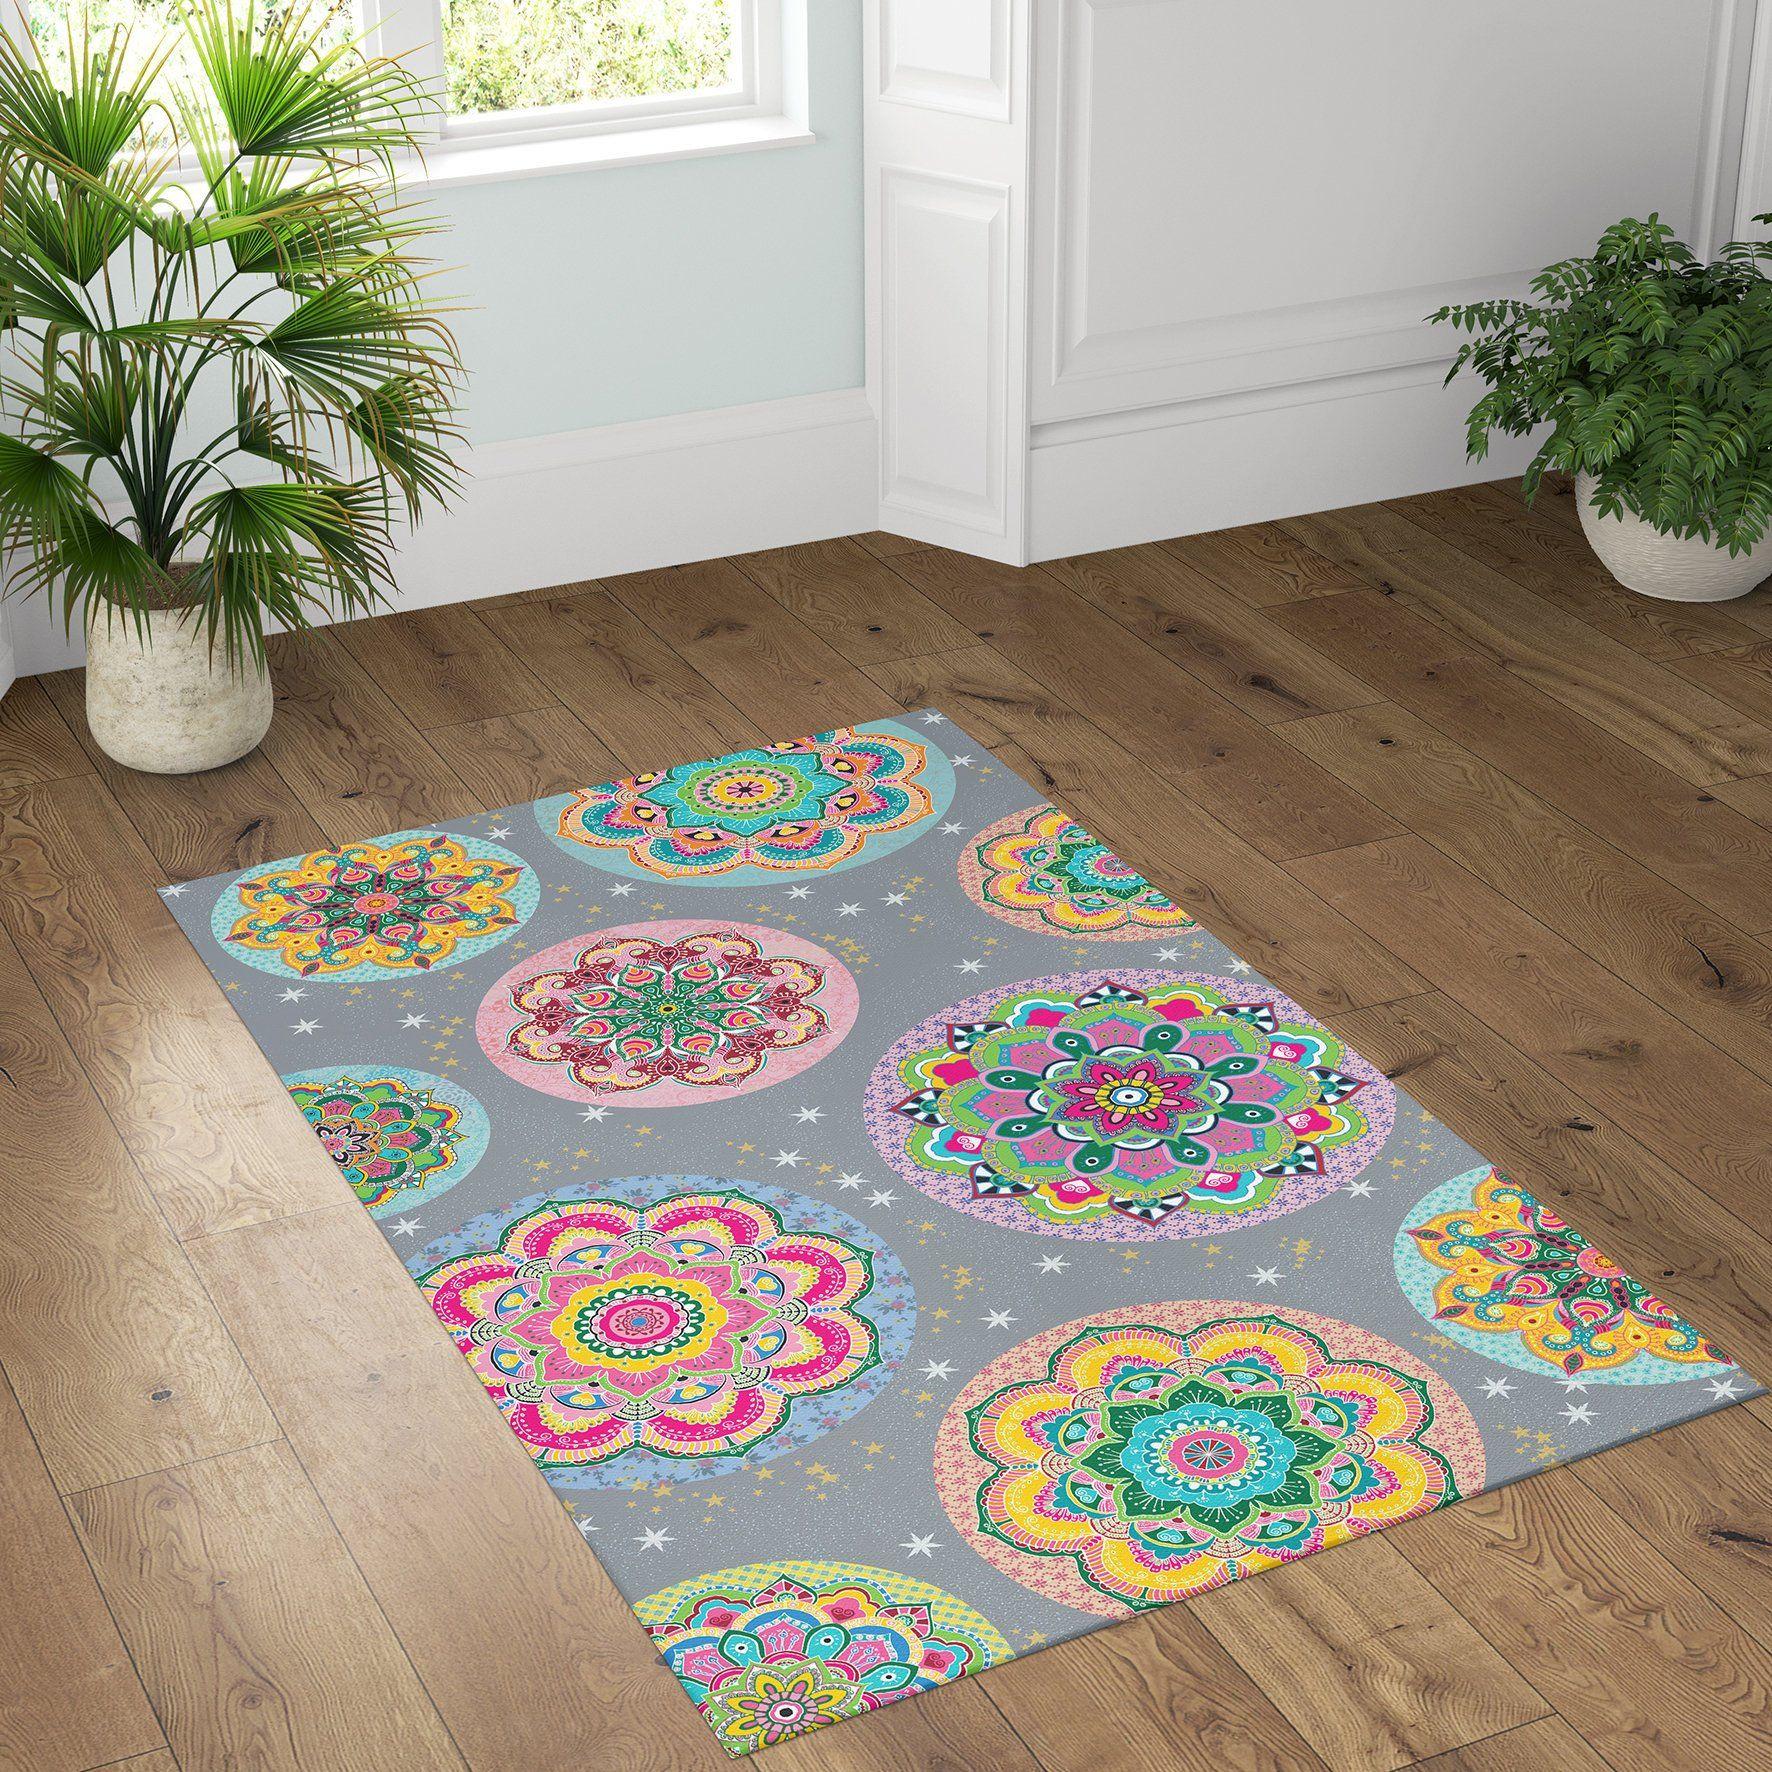 Floor Vinyl Rug Mandala Kitchen Rug Linoleum Colorful Area Rug